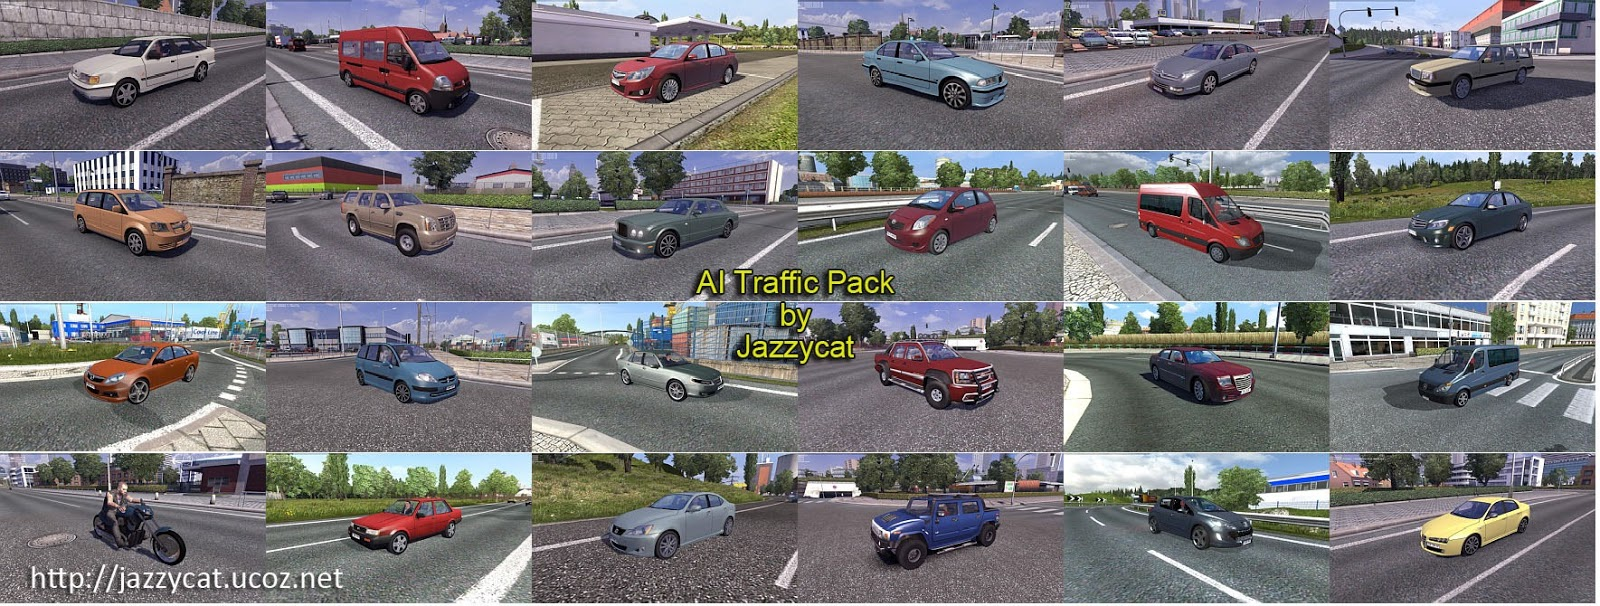 AI Traffic Pack